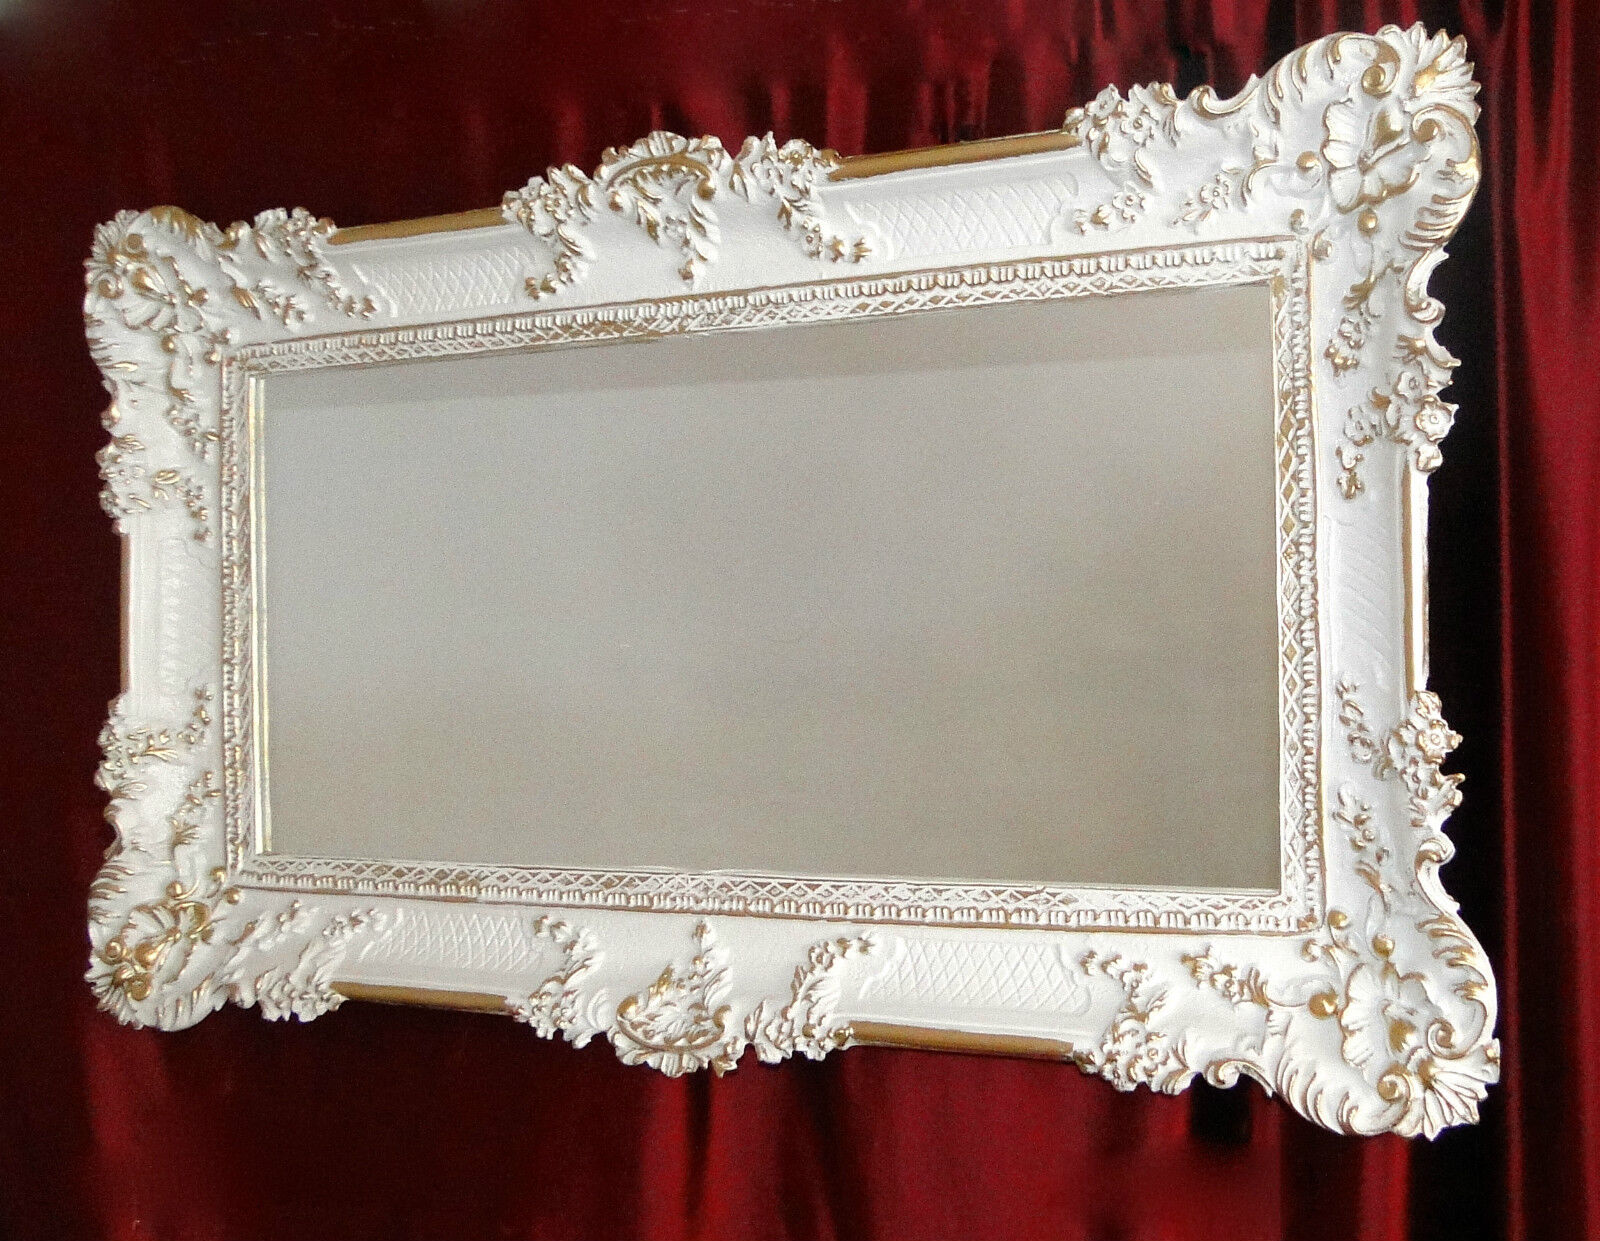 barock wandspiegel wei gold spiegel antik wanddeko 97x57. Black Bedroom Furniture Sets. Home Design Ideas